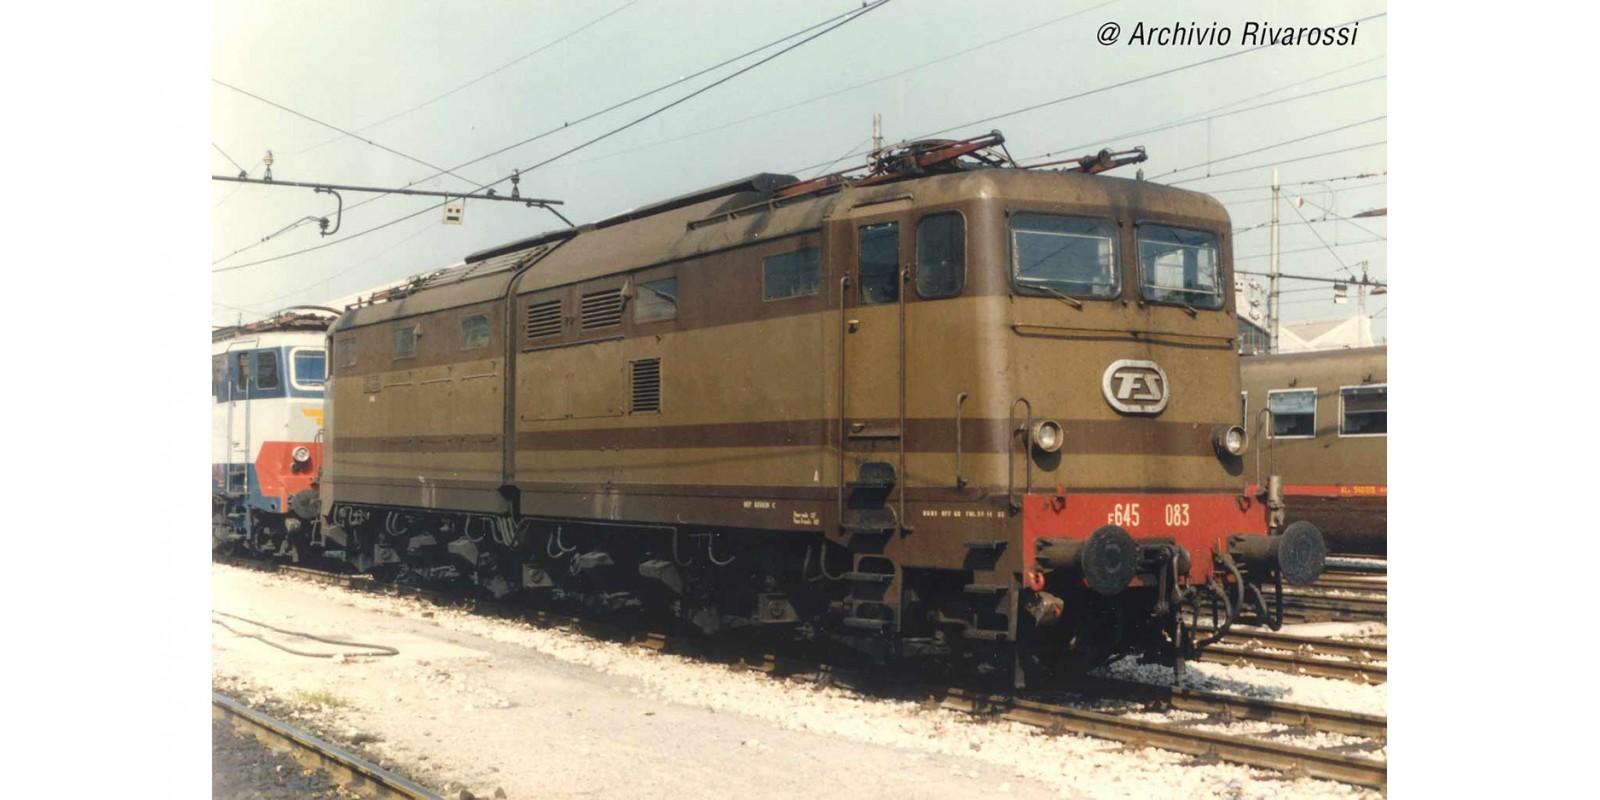 RI2872 FS, electric locomotive E.645 2nd series castano/isabella livery, original front windows, ep. IV-V